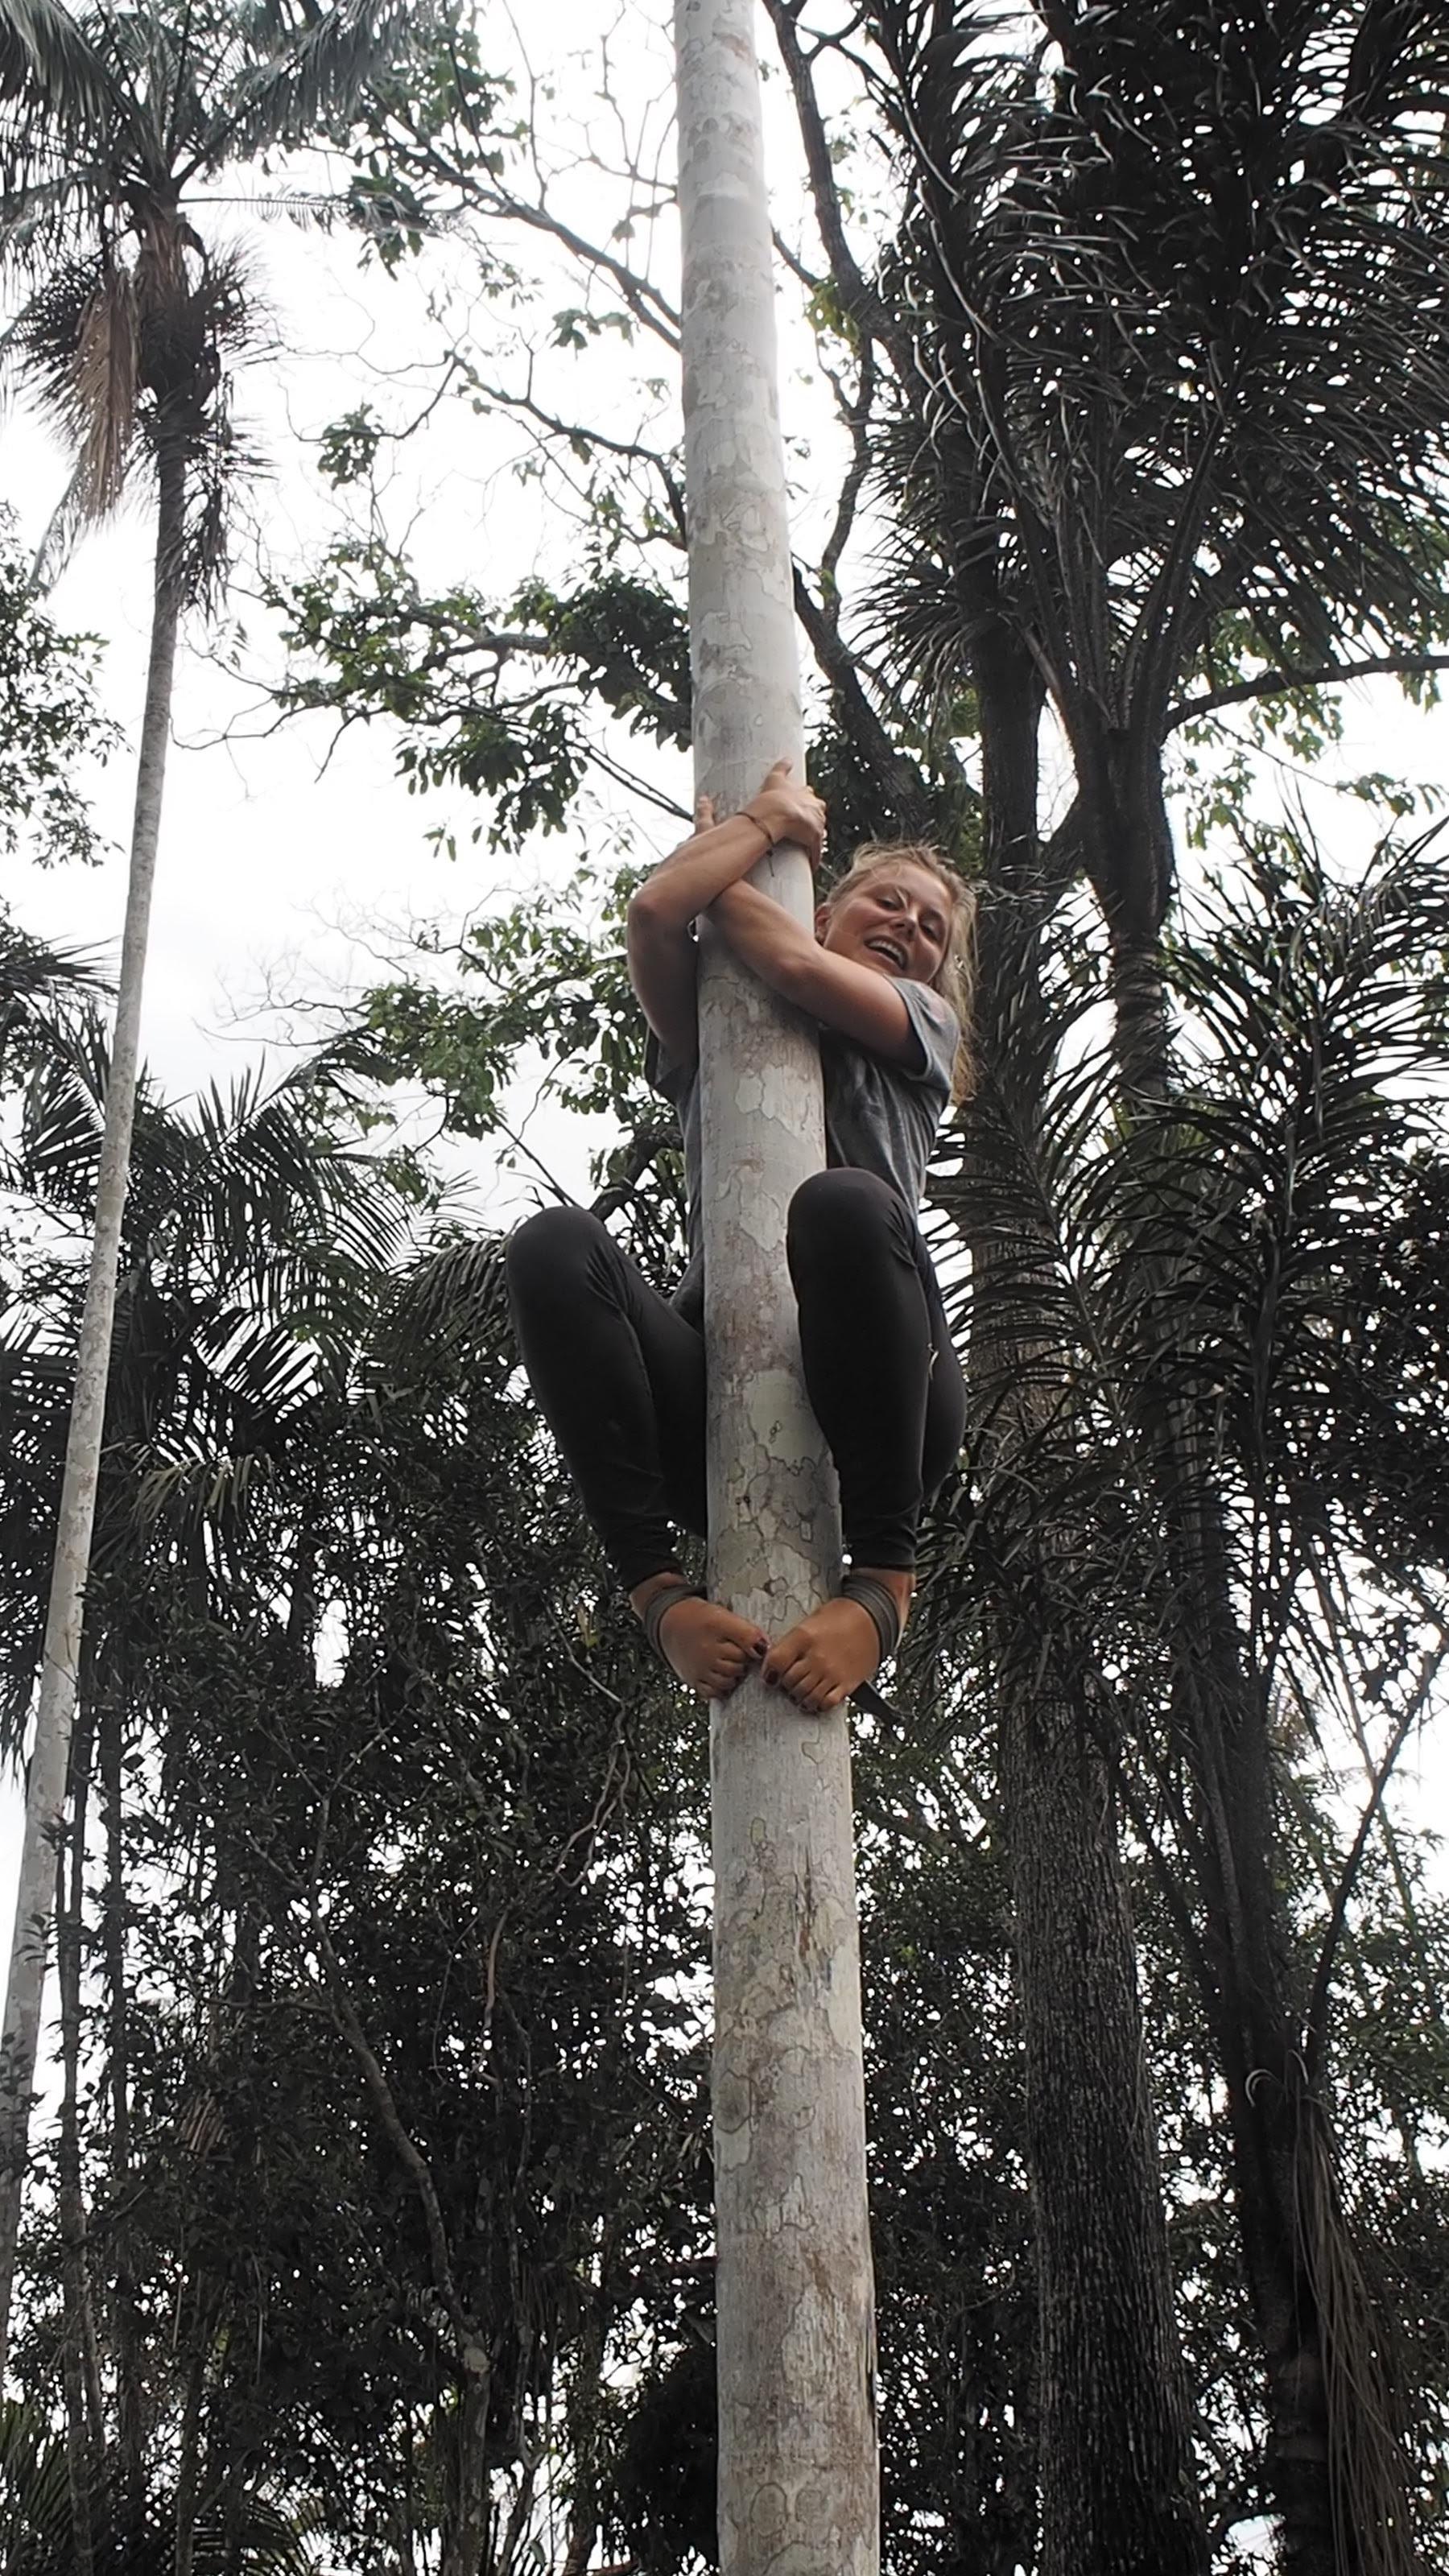 Açaí palm climbing